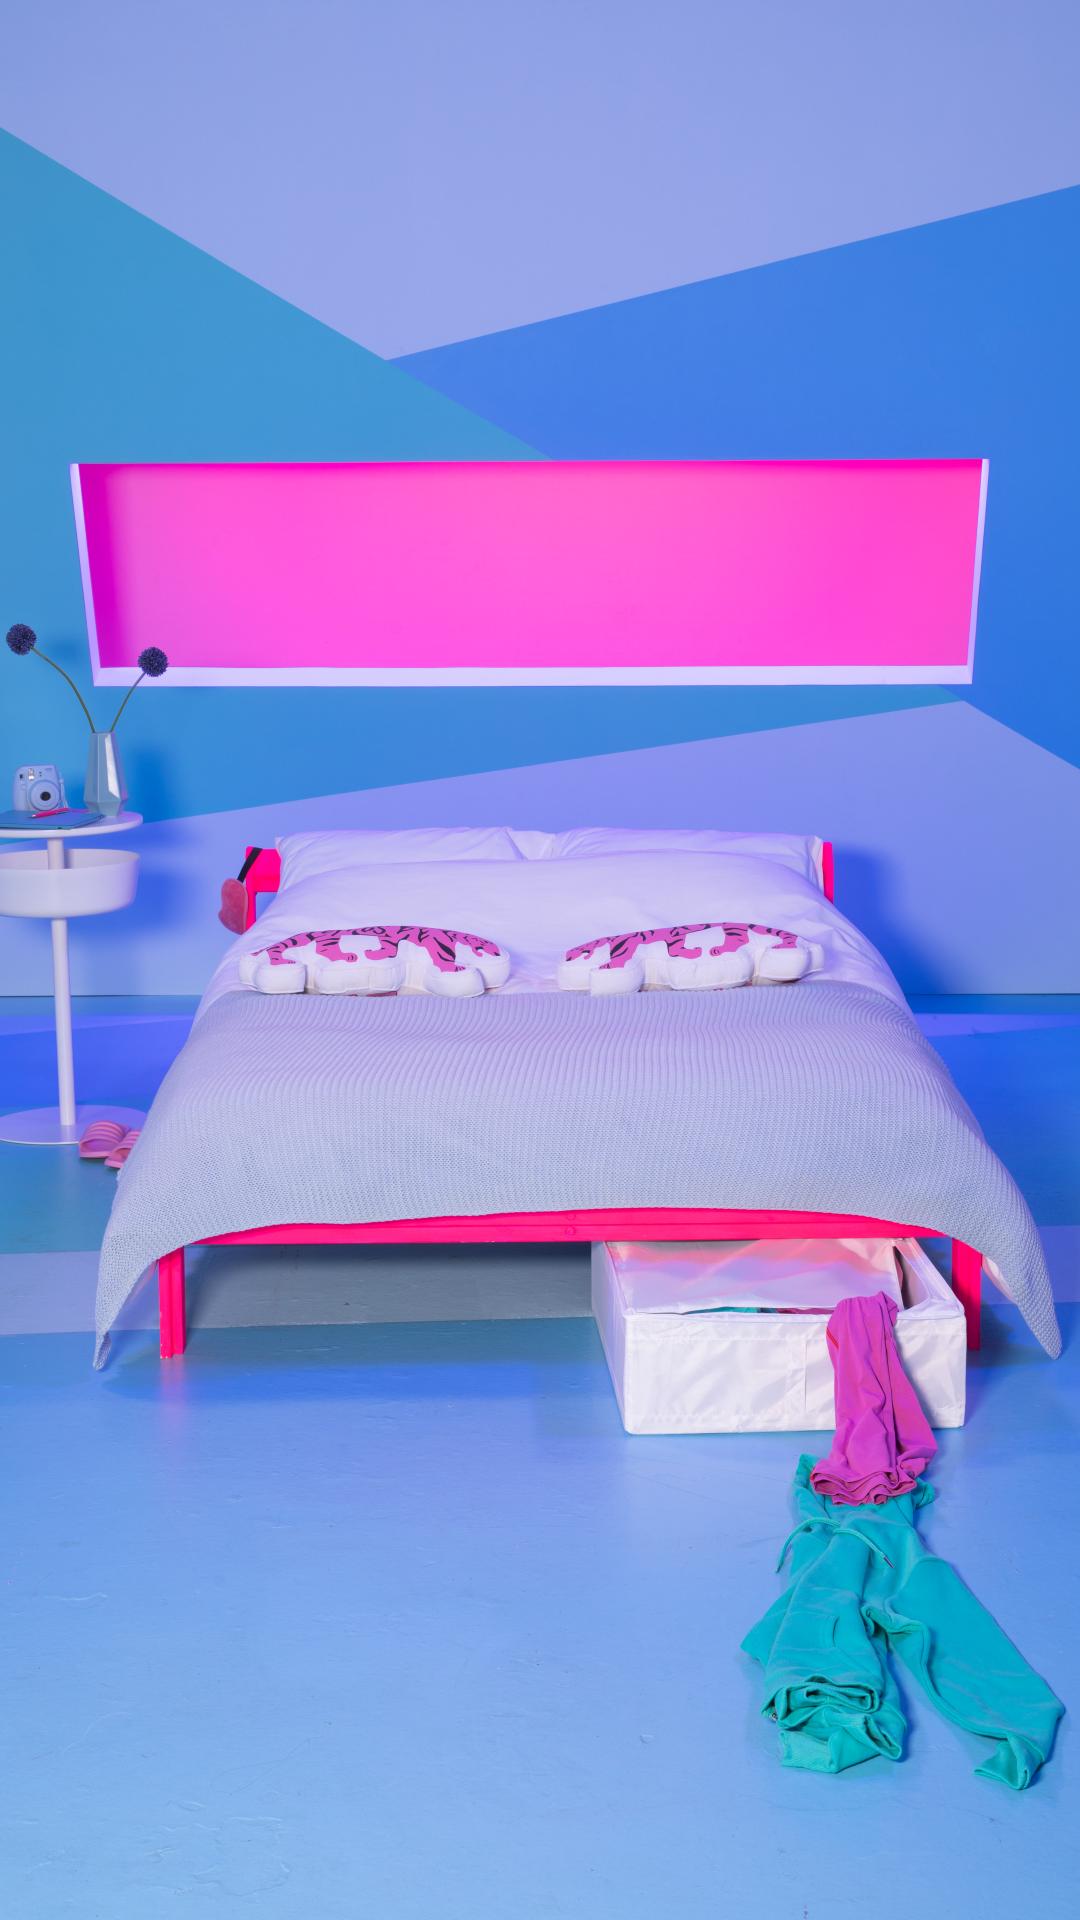 Neiden Bedframe Grenen 140x200 Cm Ikea Kind Slaapkamers Bedframe Ikea Bed